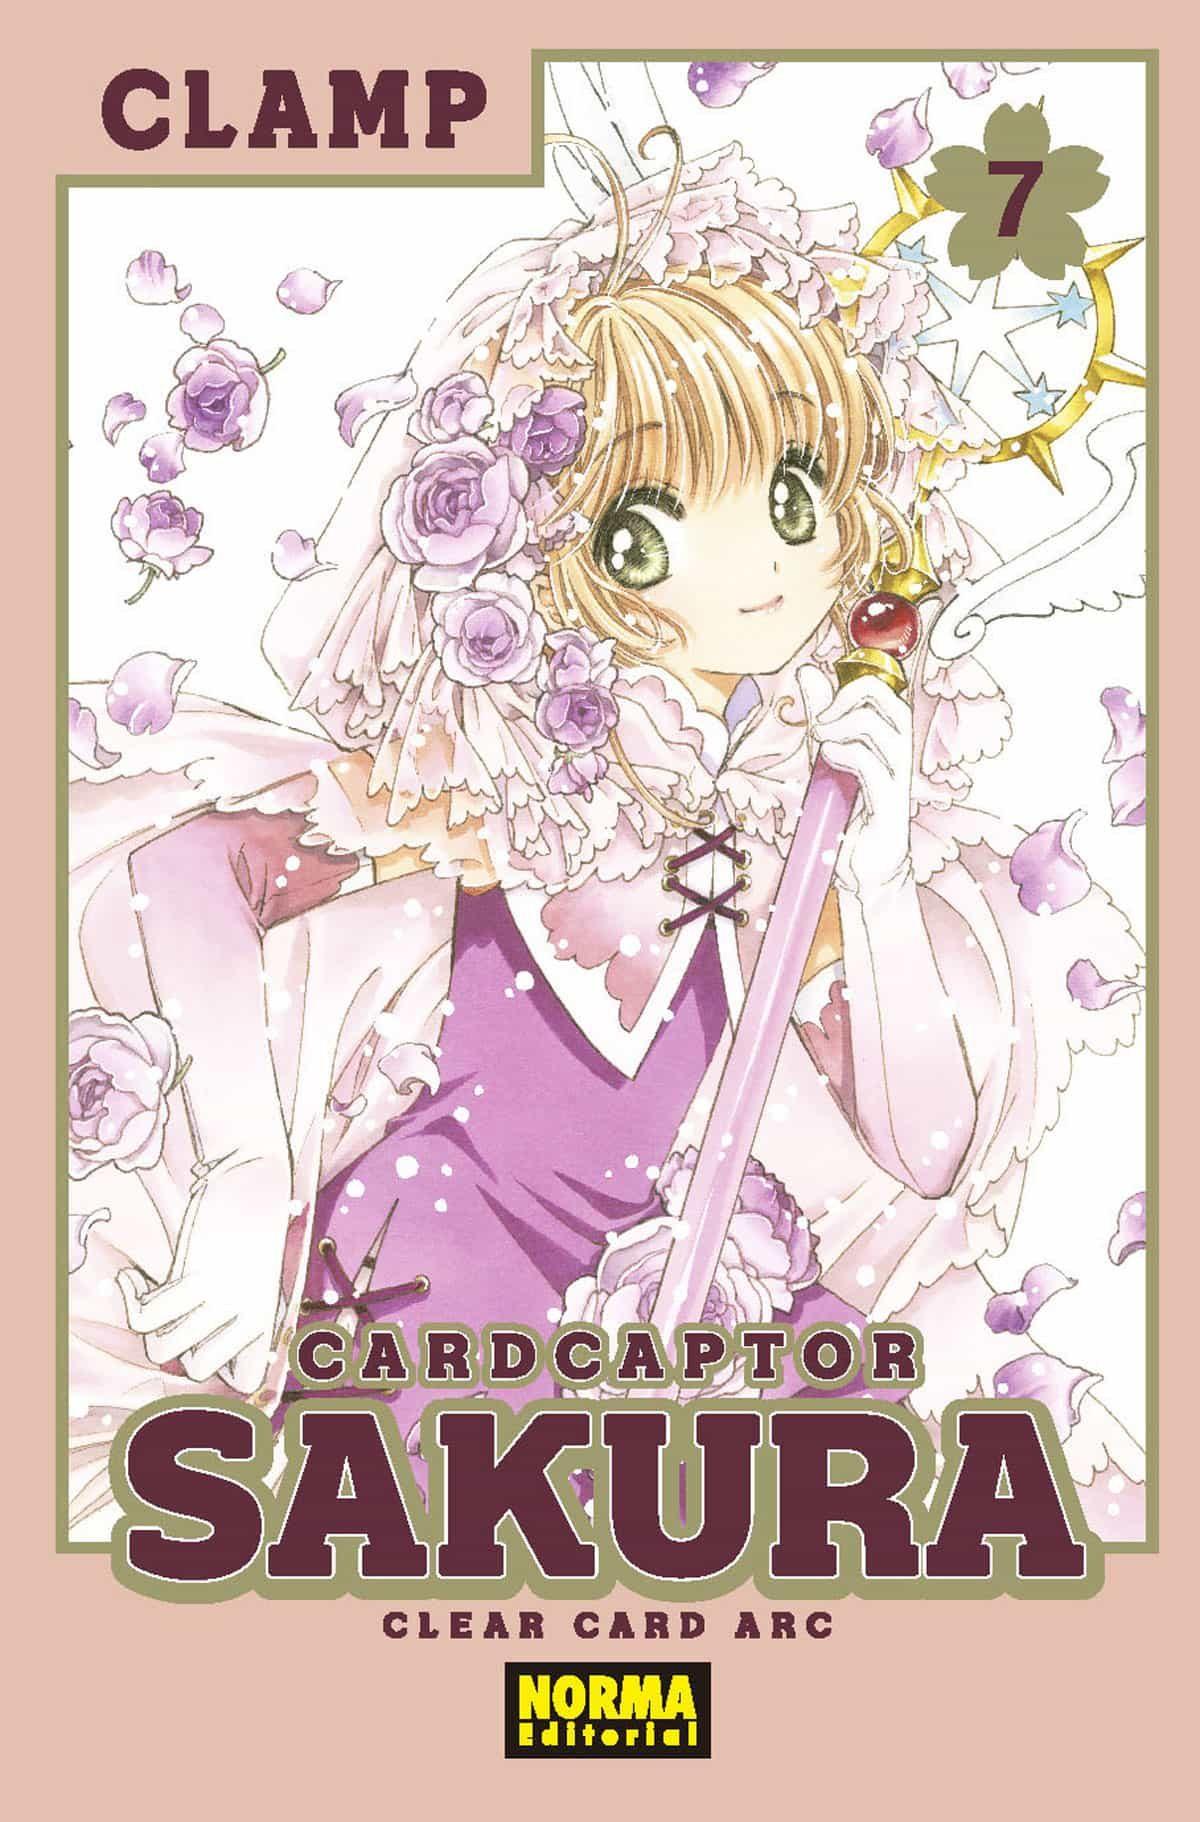 Cardcaptor Sakura Clear Card Arc 7 - Clamp